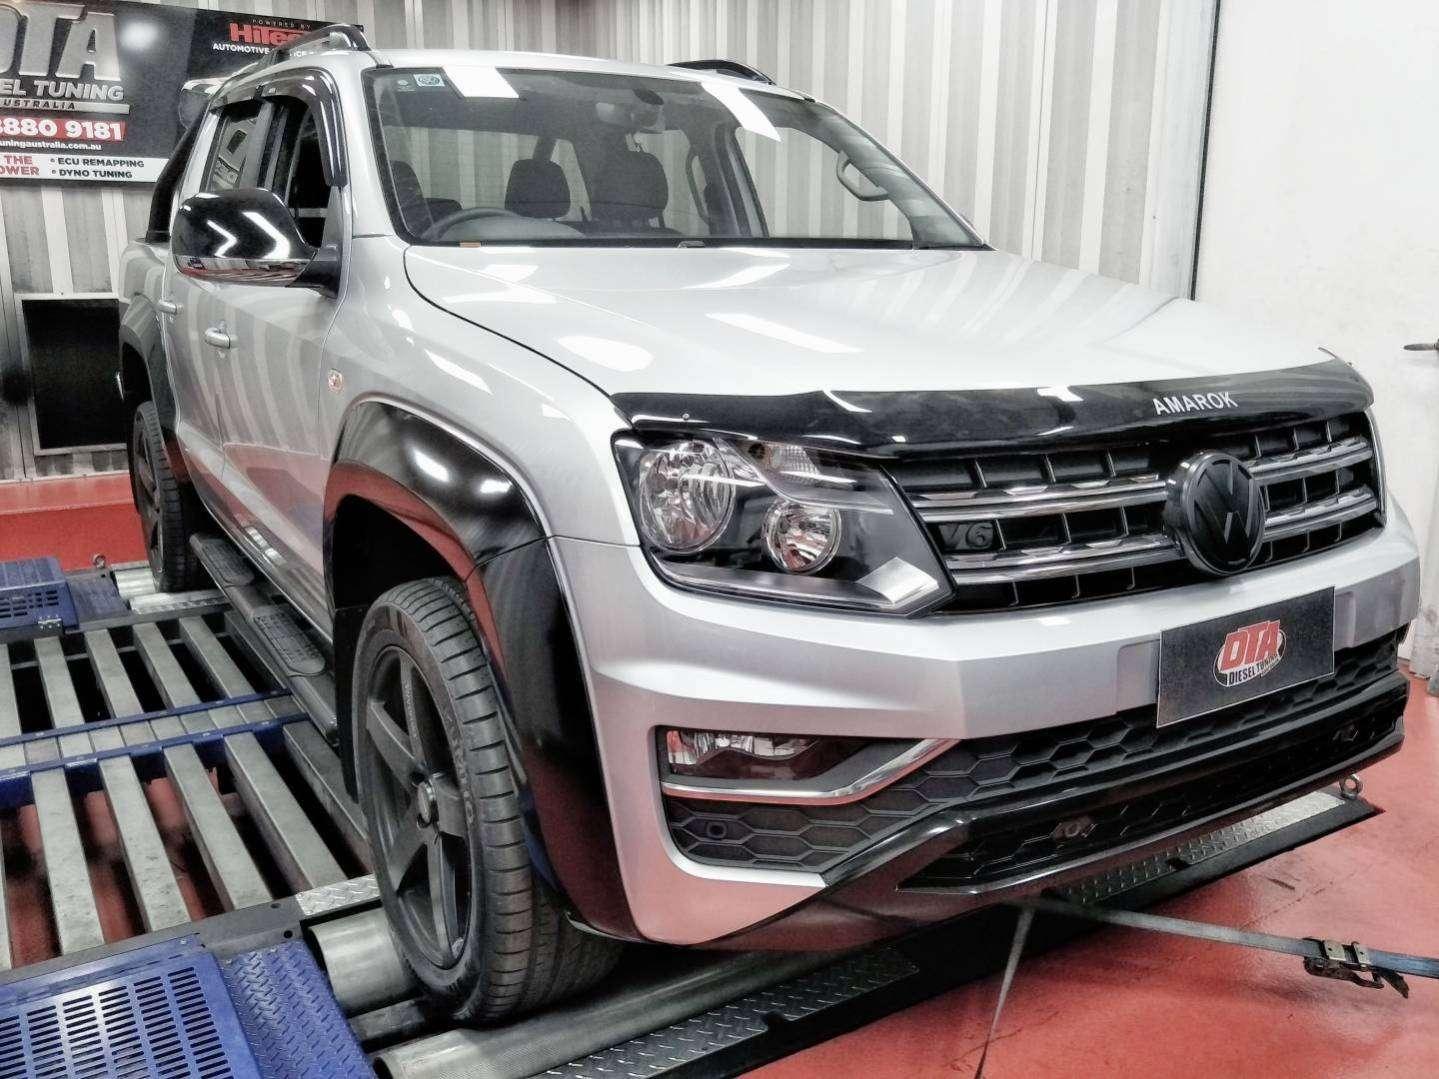 Volkswagen Amarok 2017 V6 Diesel Tuning Australia